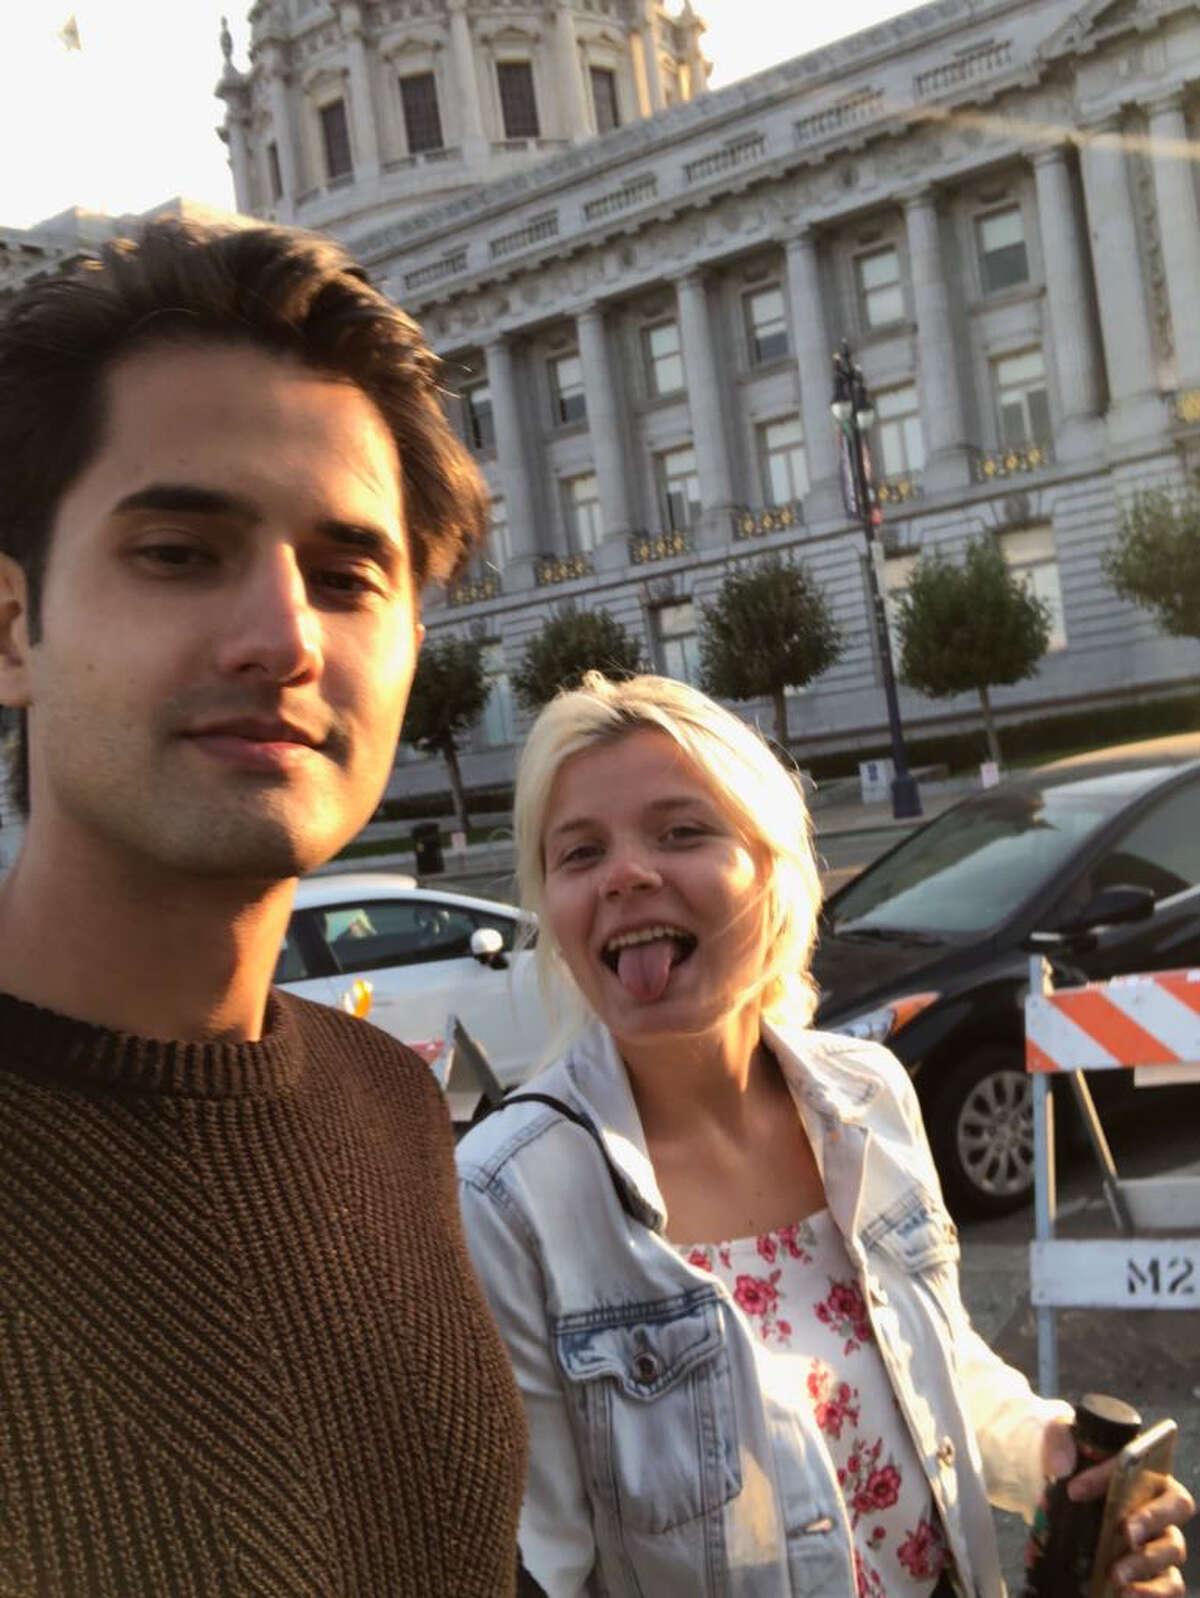 Saskia Talvio and Serdar Serttop pose for a selfie as they walk by San Francisco City Hall.